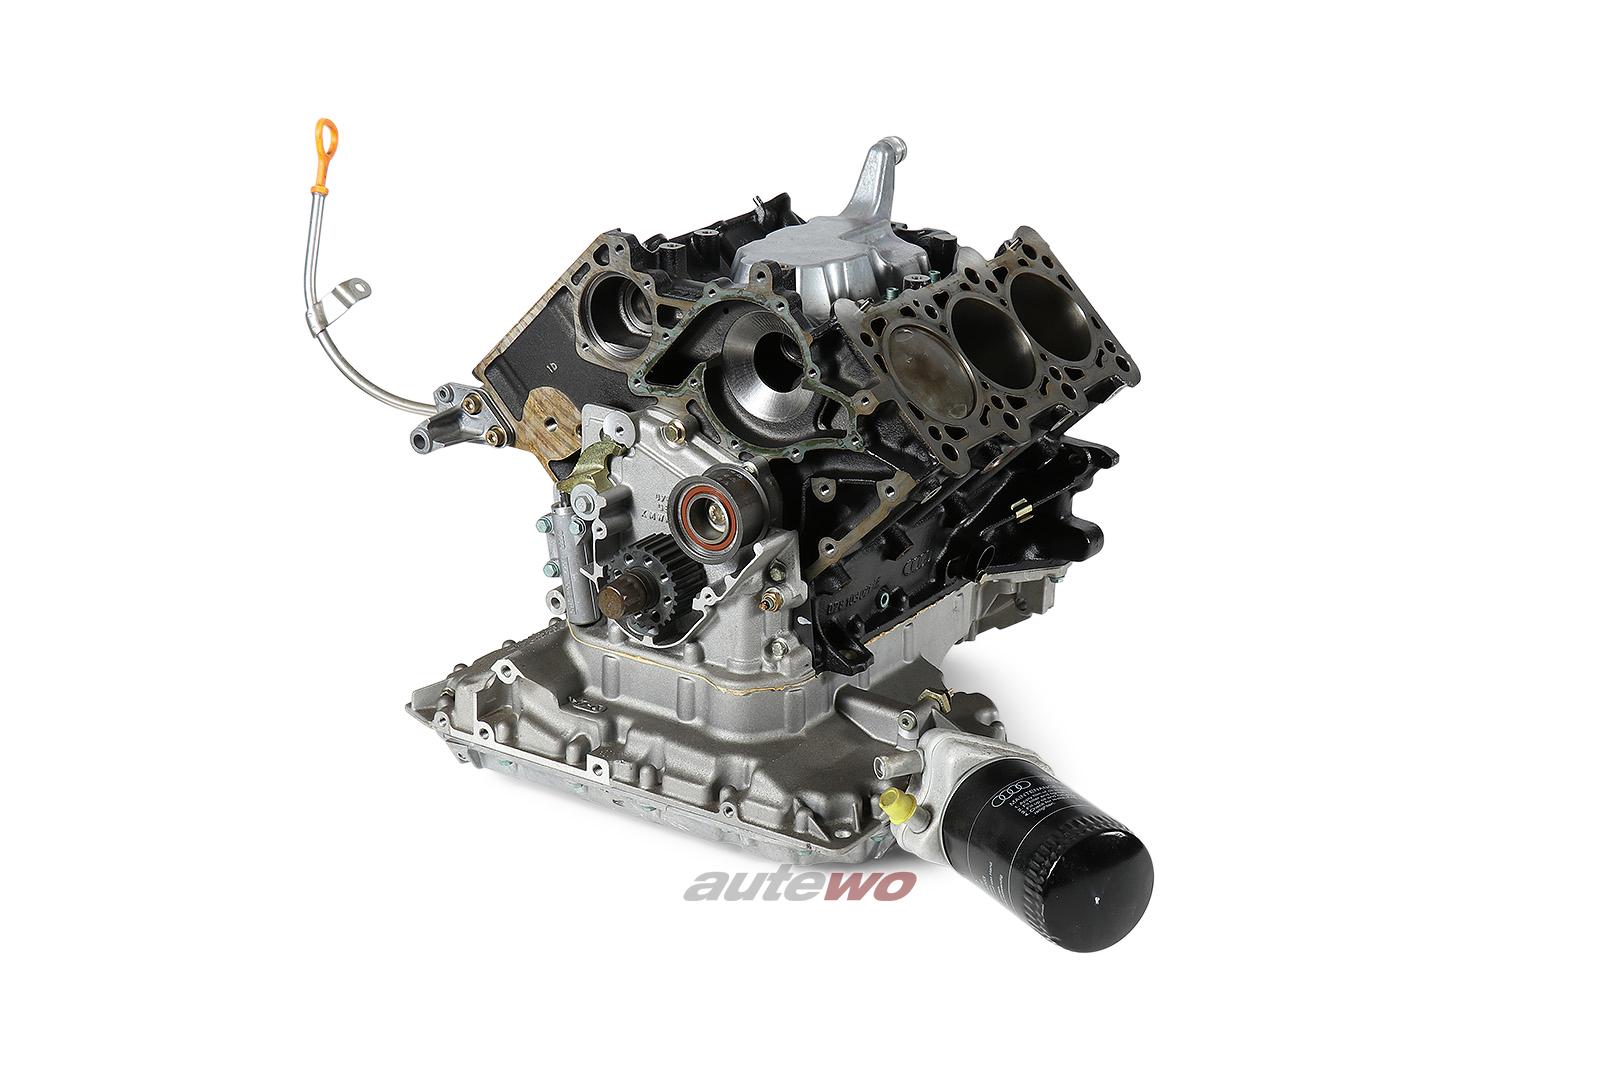 078103101BB NEU VW Passat 3B 2.8l V6 ALG Motor auch ACK/ALG/AGE/APR/AQD/ATX